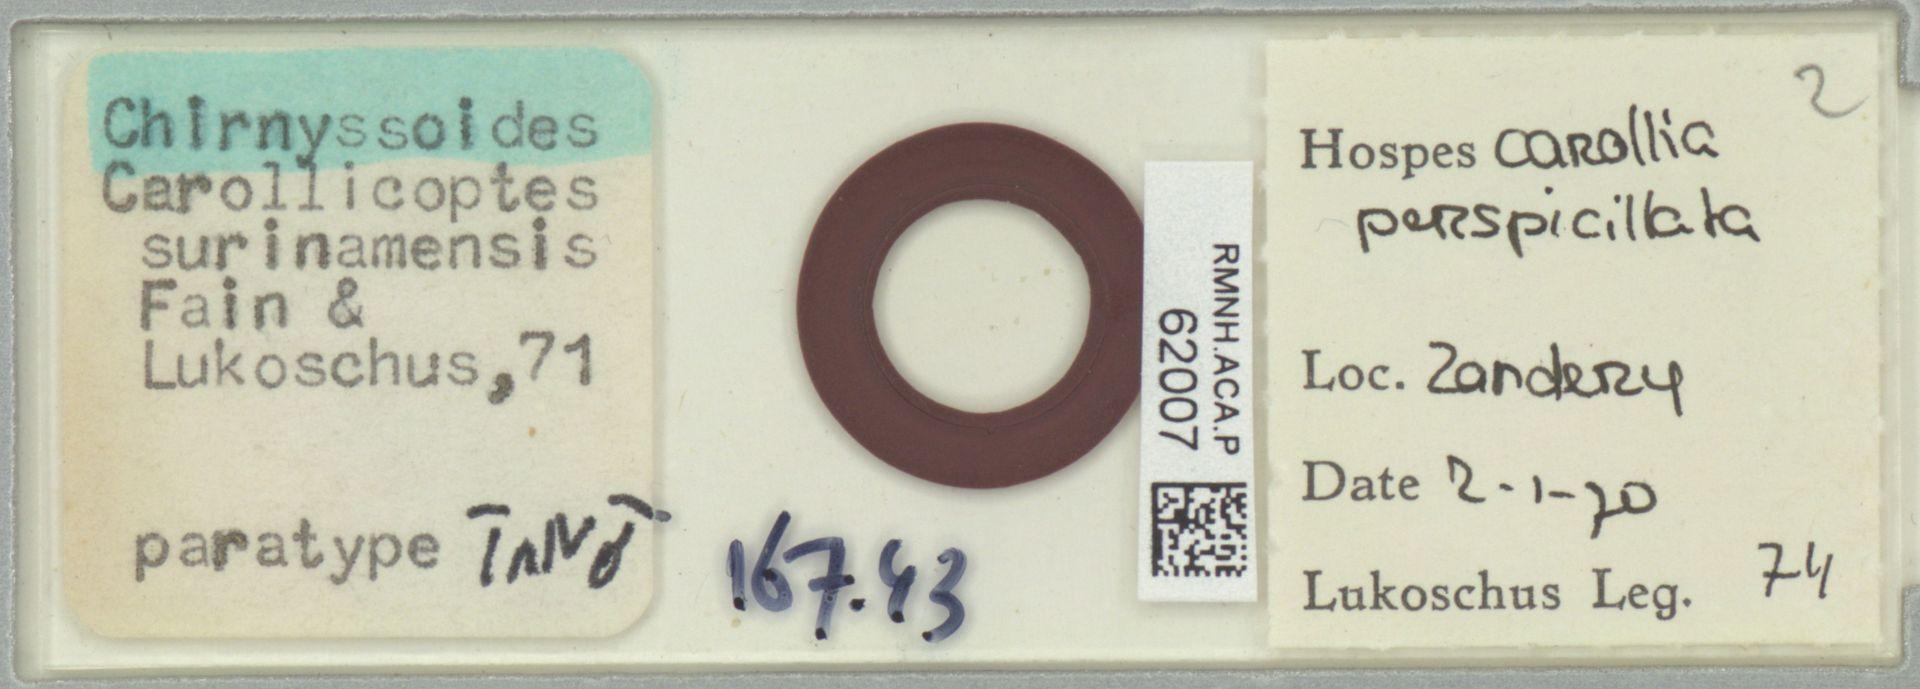 RMNH.ACA.P.62007 | Chirnyssoides (Carrolicoptes) surinamensis Fain & Lukoschus, 71